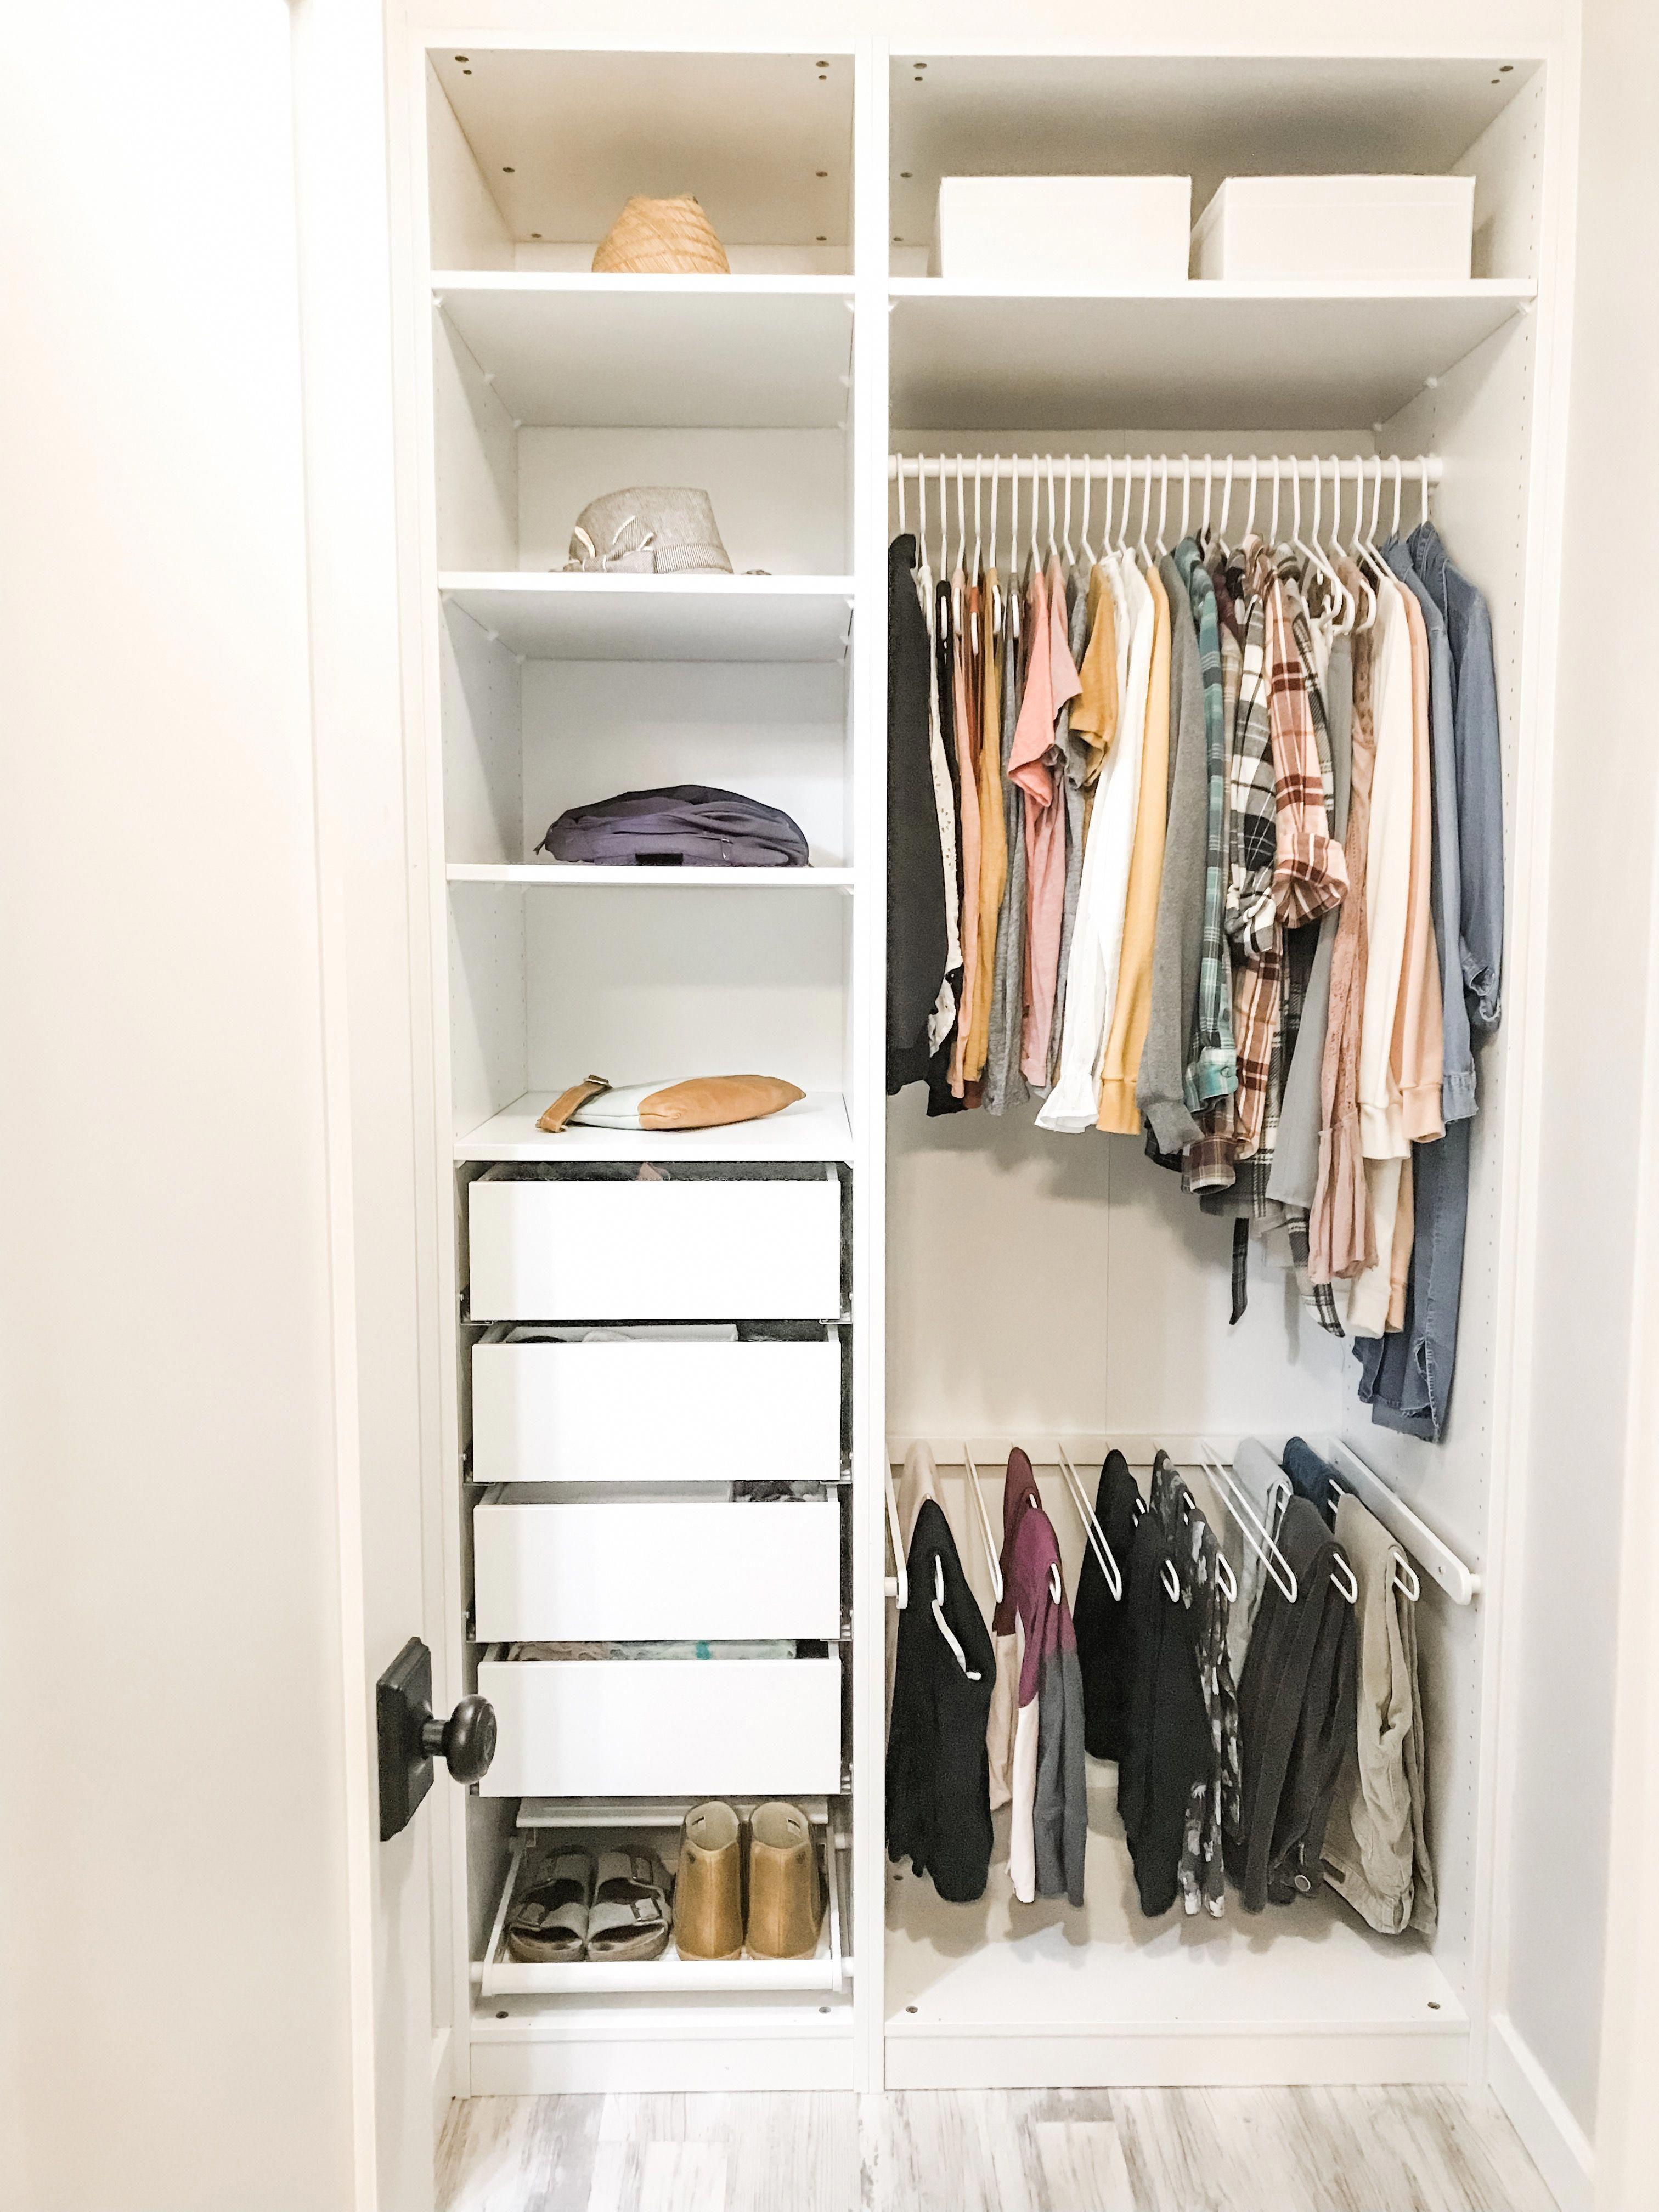 Women S Minimalist Wardrobe And Closet Minimalistbedroom Wardrobe Room Closet Layout Small Closet Space